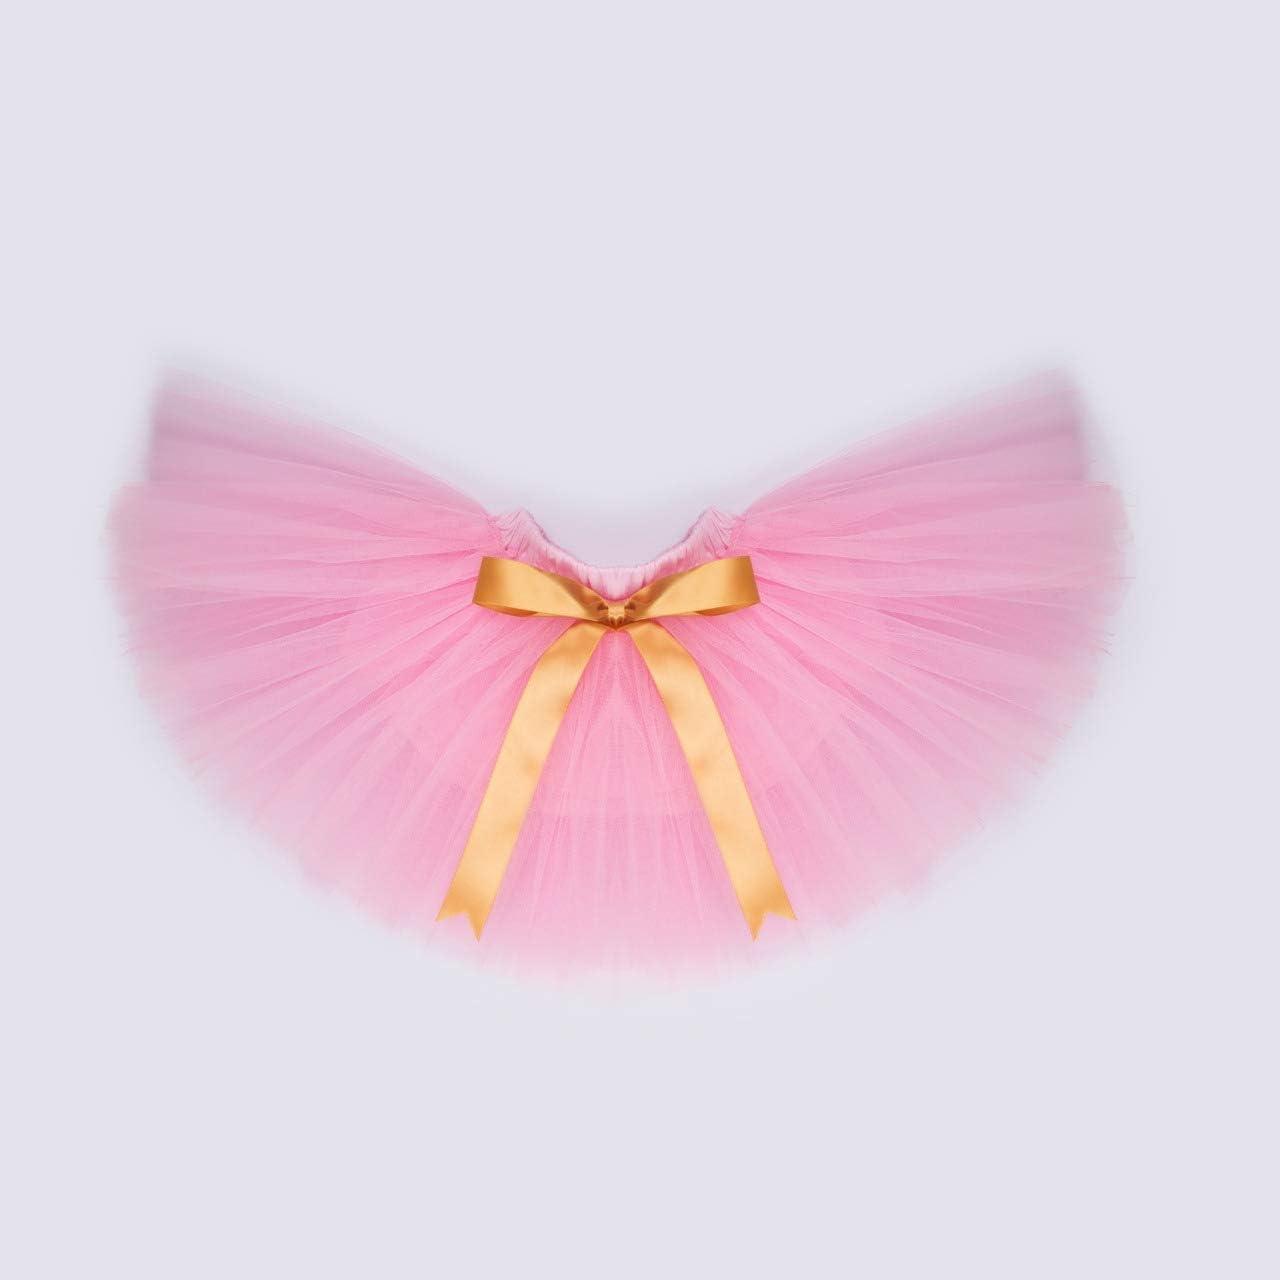 Infant Kids Tutu Outfits Creative Festive Costume Baby Girl 1st Birthday Dress